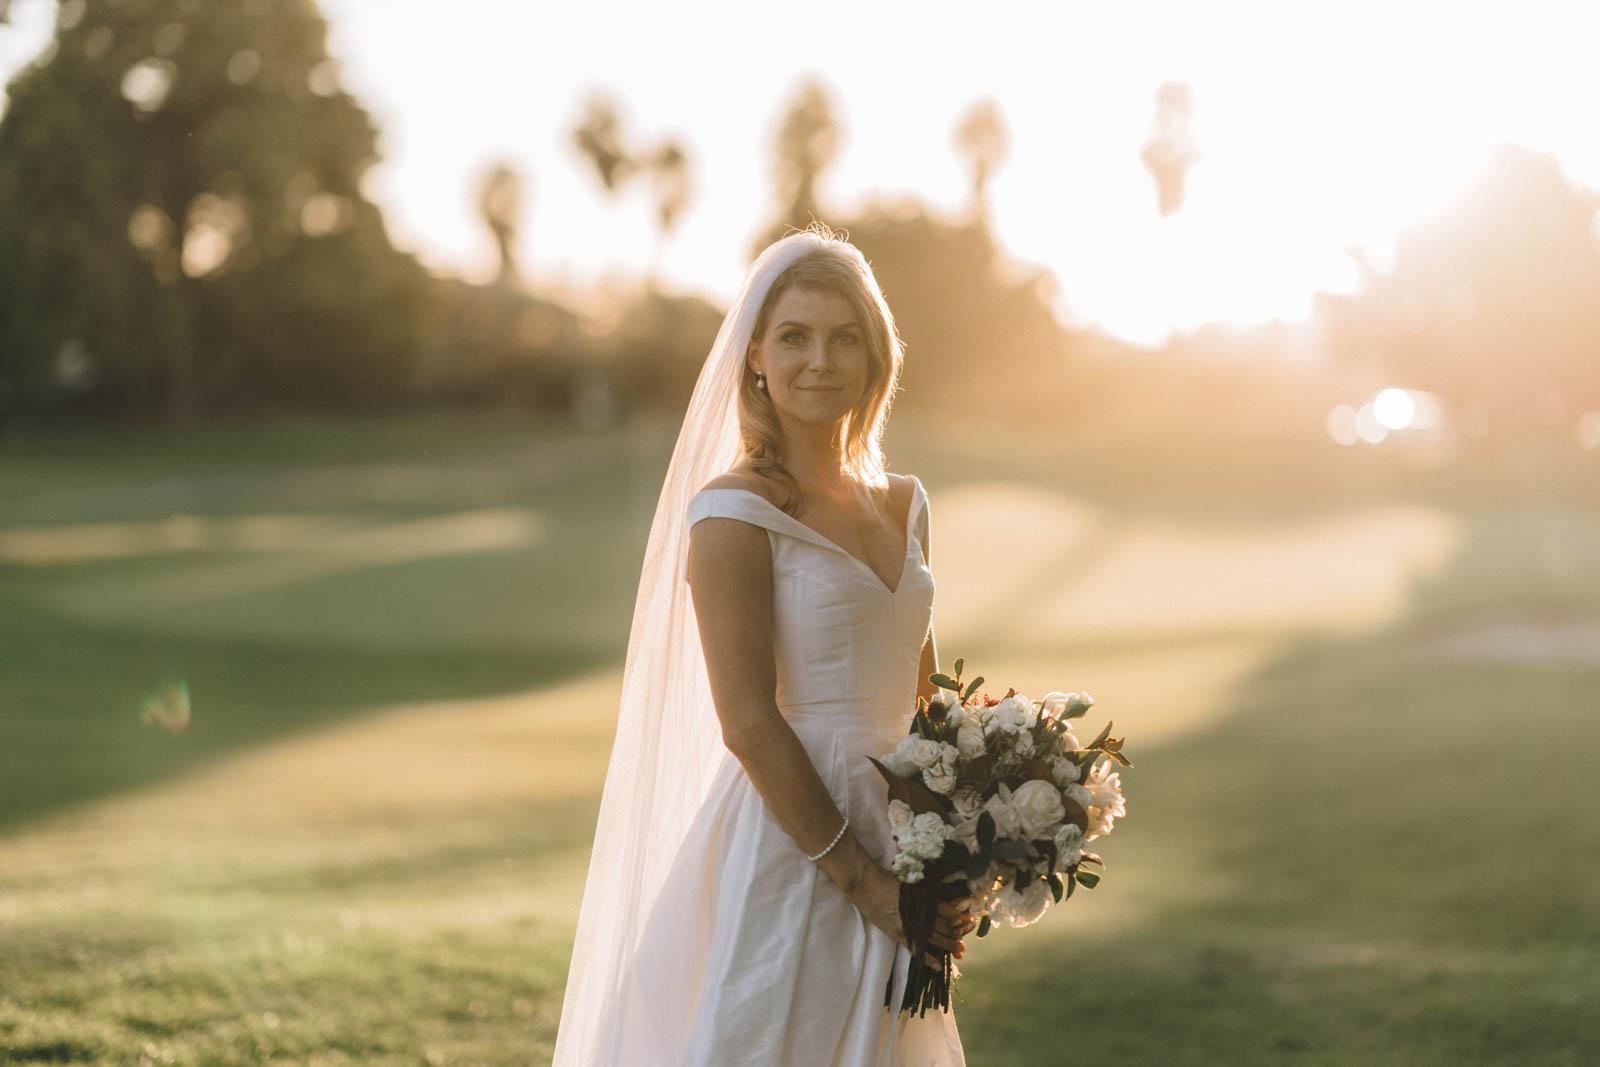 newfound-s-p-mt-maunganui-tauranga-wedding-photographer-1800-A9_07453